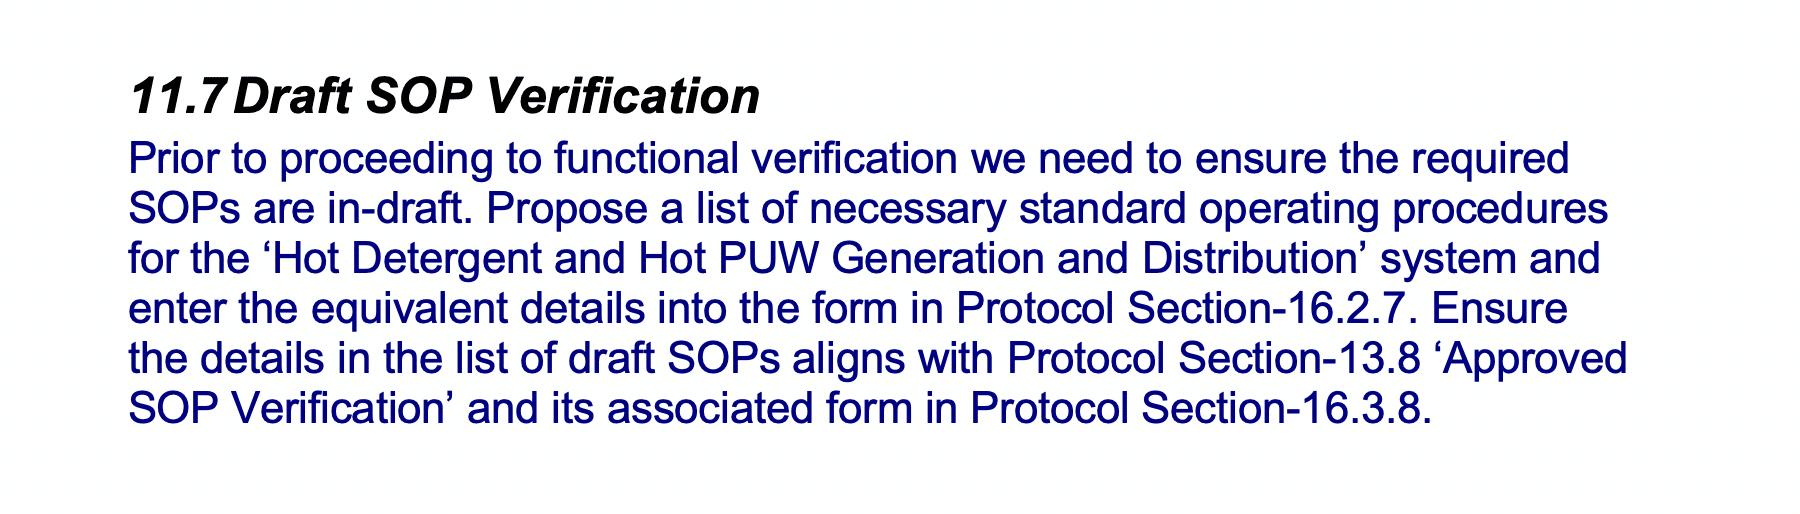 9 Draft-SOP-(Standard-Operating-Procedure)-Verification-GetReskilled